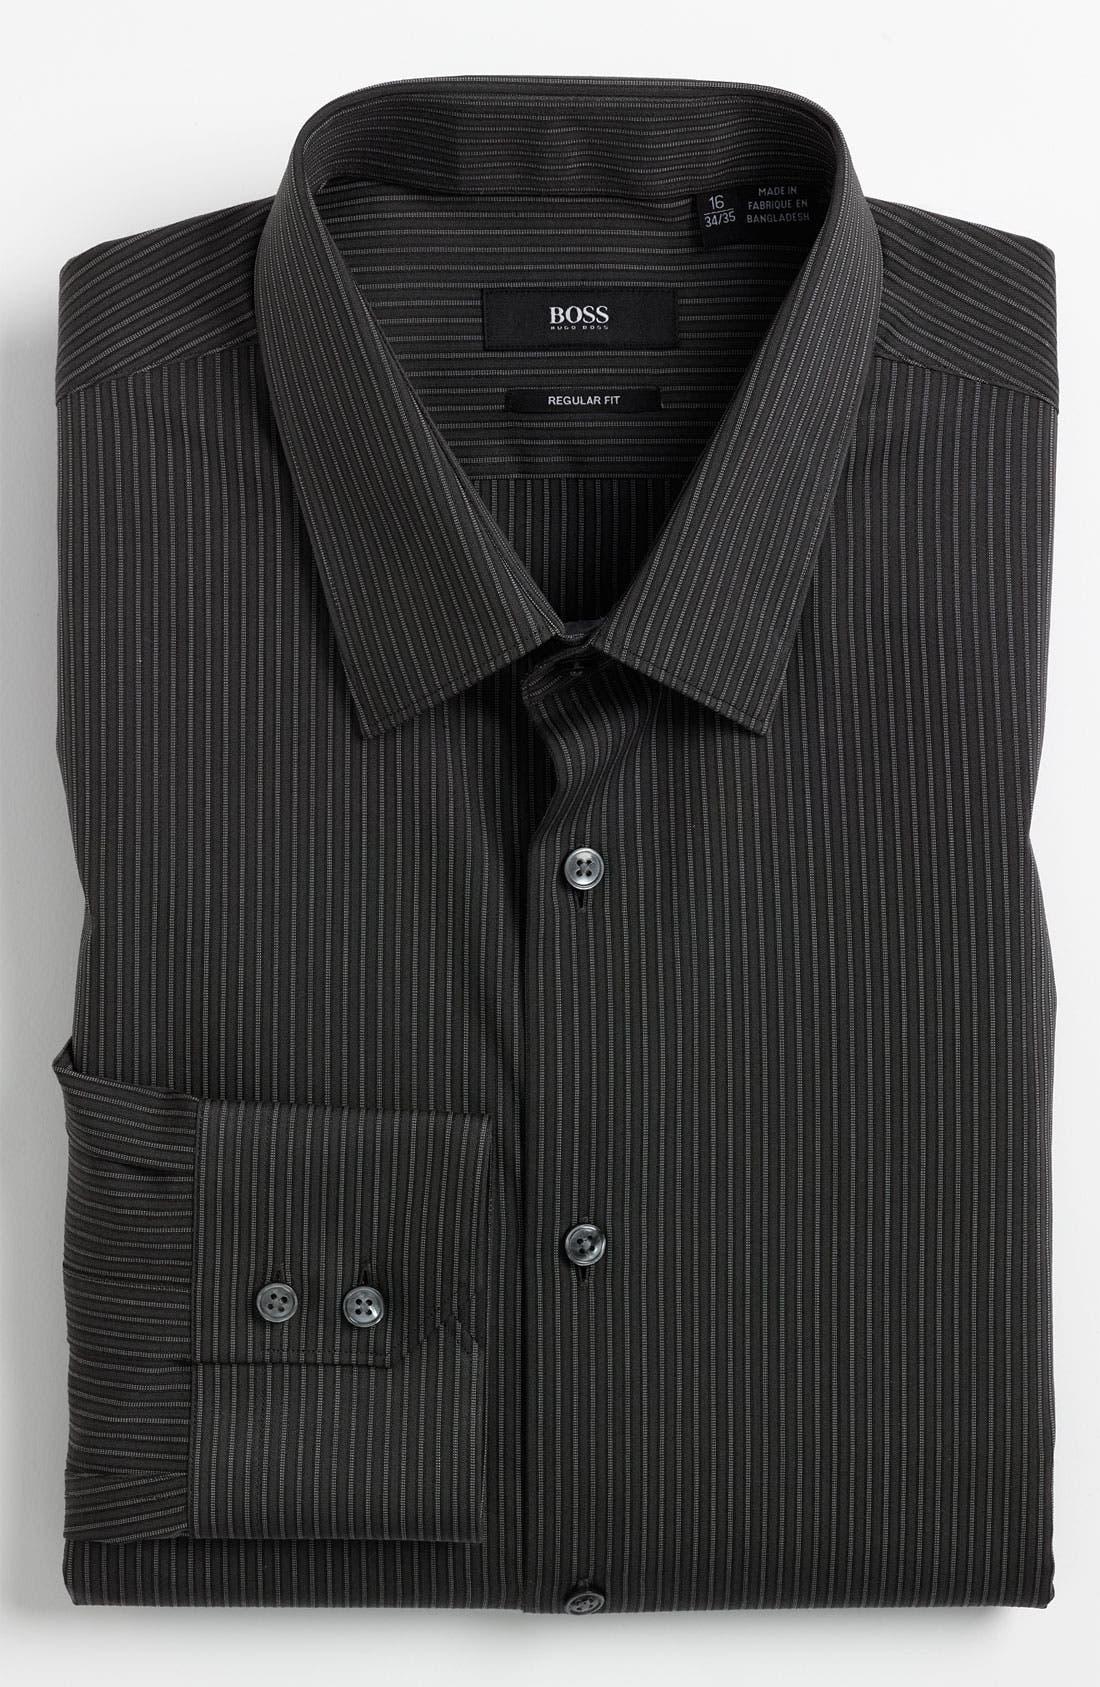 Main Image - BOSS Black Regular Fit Dress Shirt